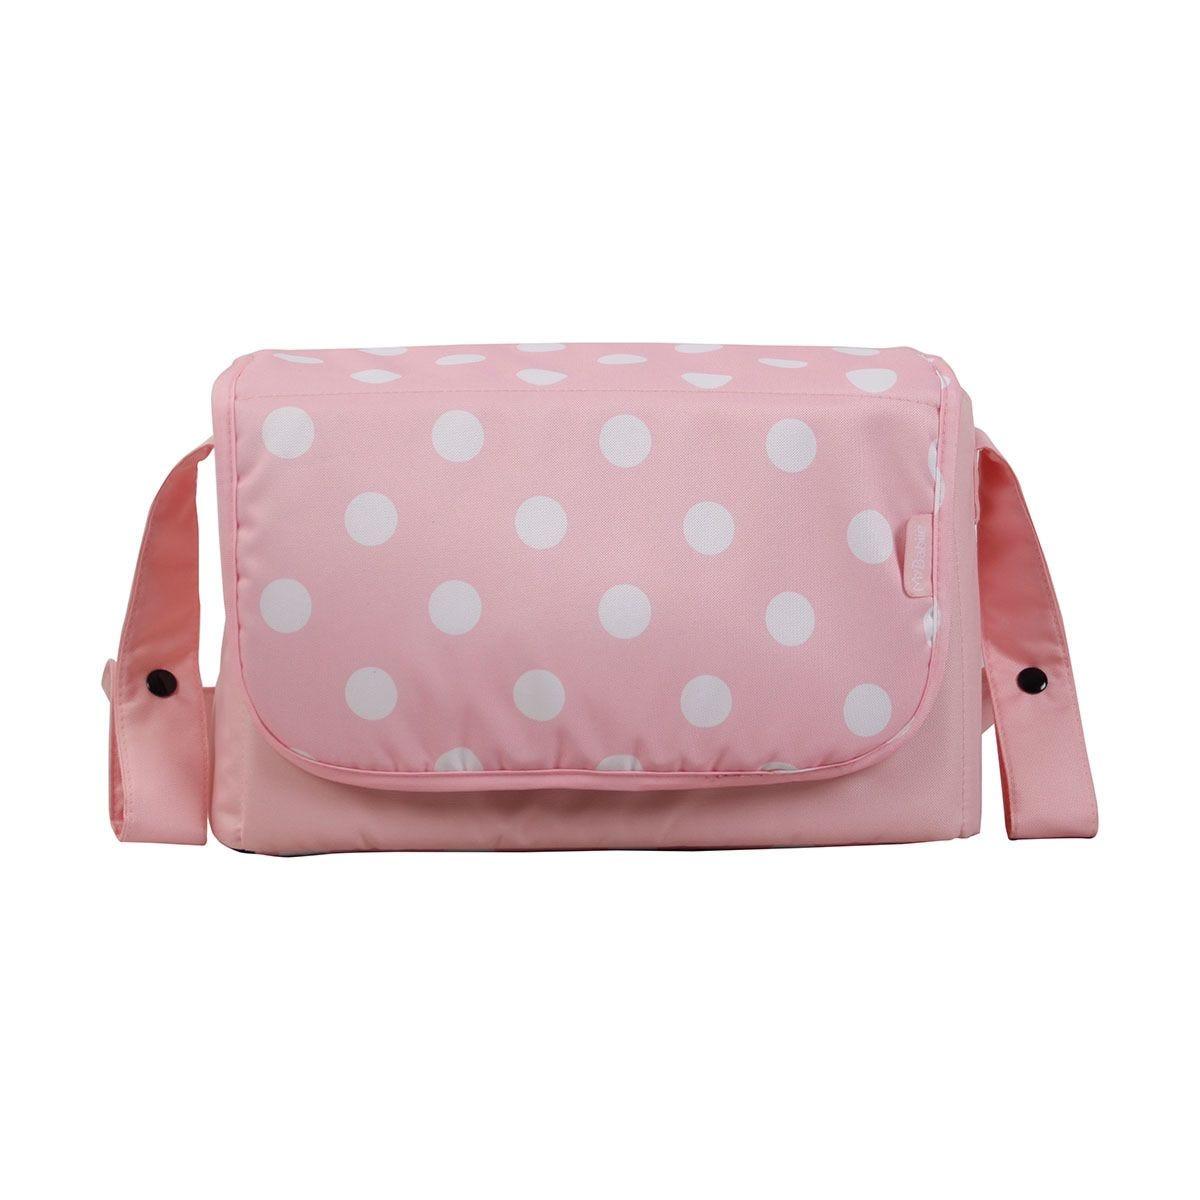 My Babiie Changing Bag - Pink  Polka